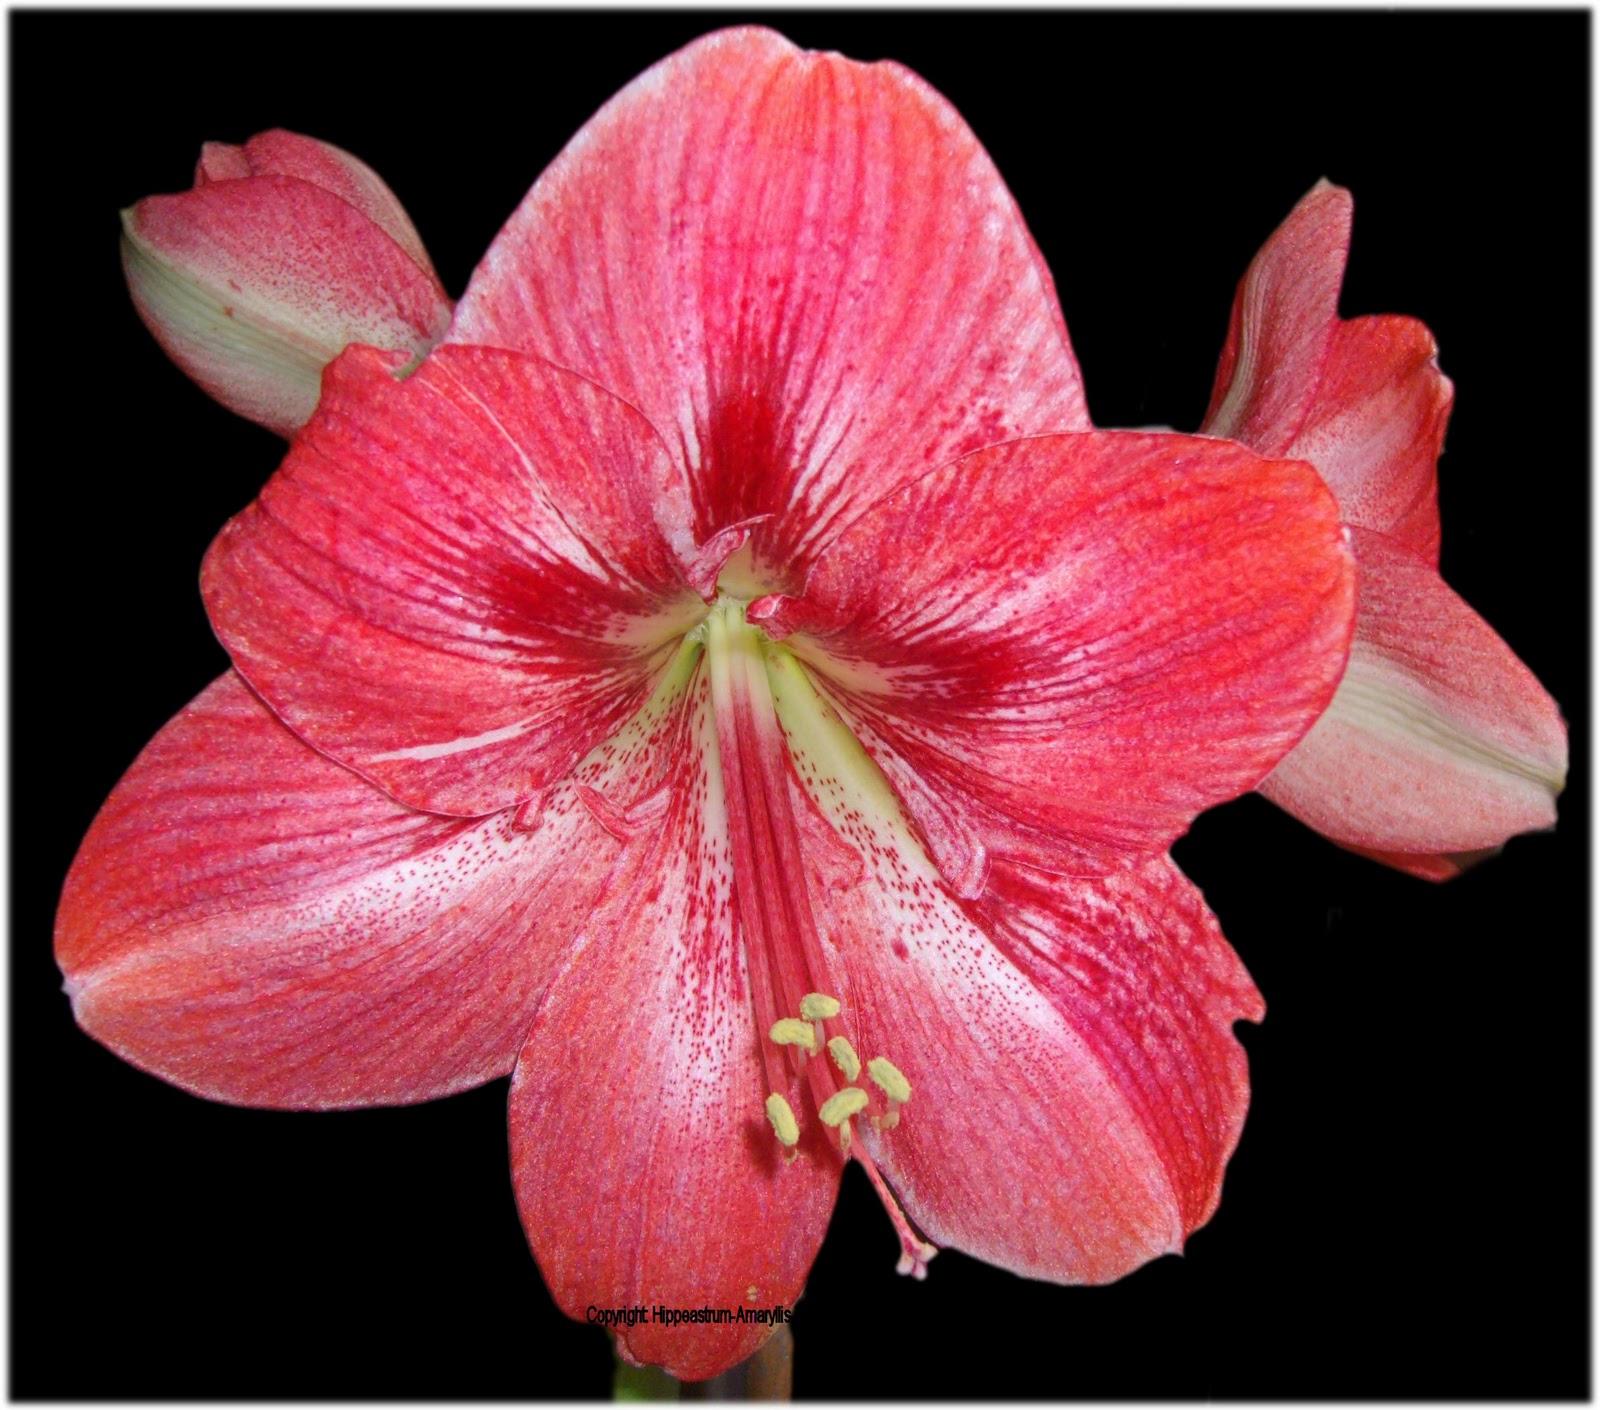 Hippeastrum amaryllis welt h 39 pink surprise 39 for Amaryllis sweet pink